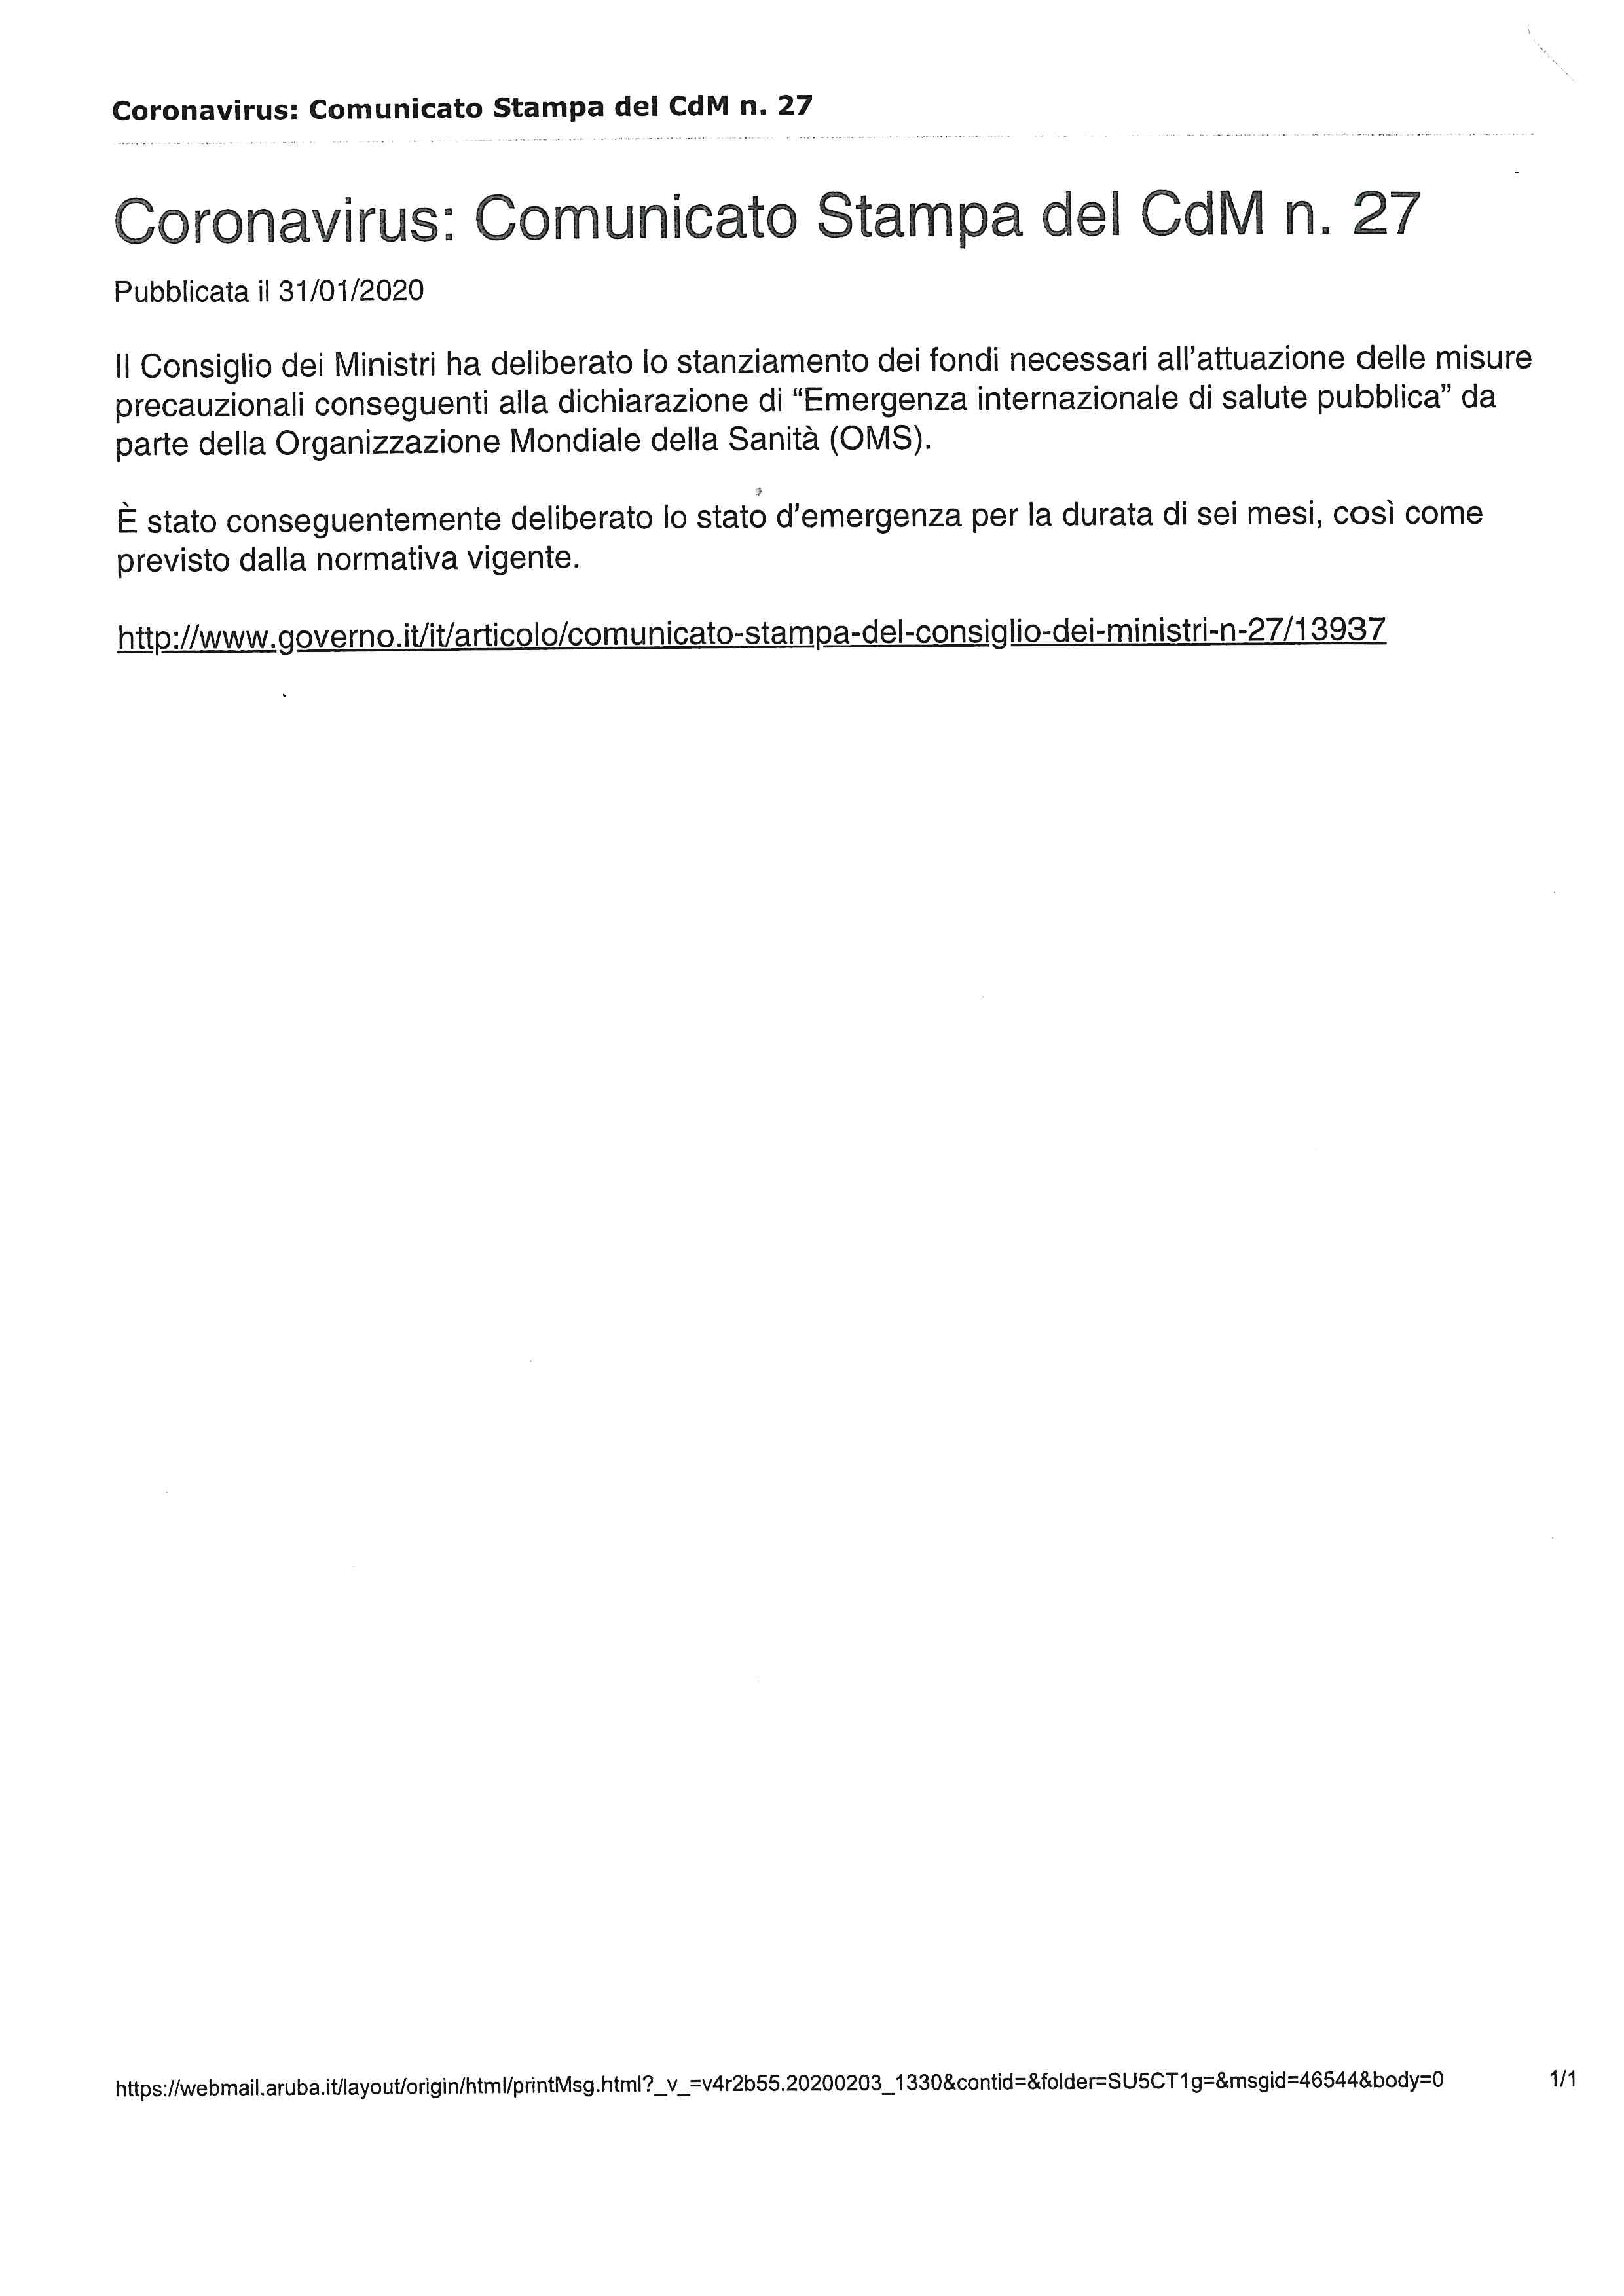 CORONAVIRUS: COMUNICATO STAMPA DEL CDM N. 27